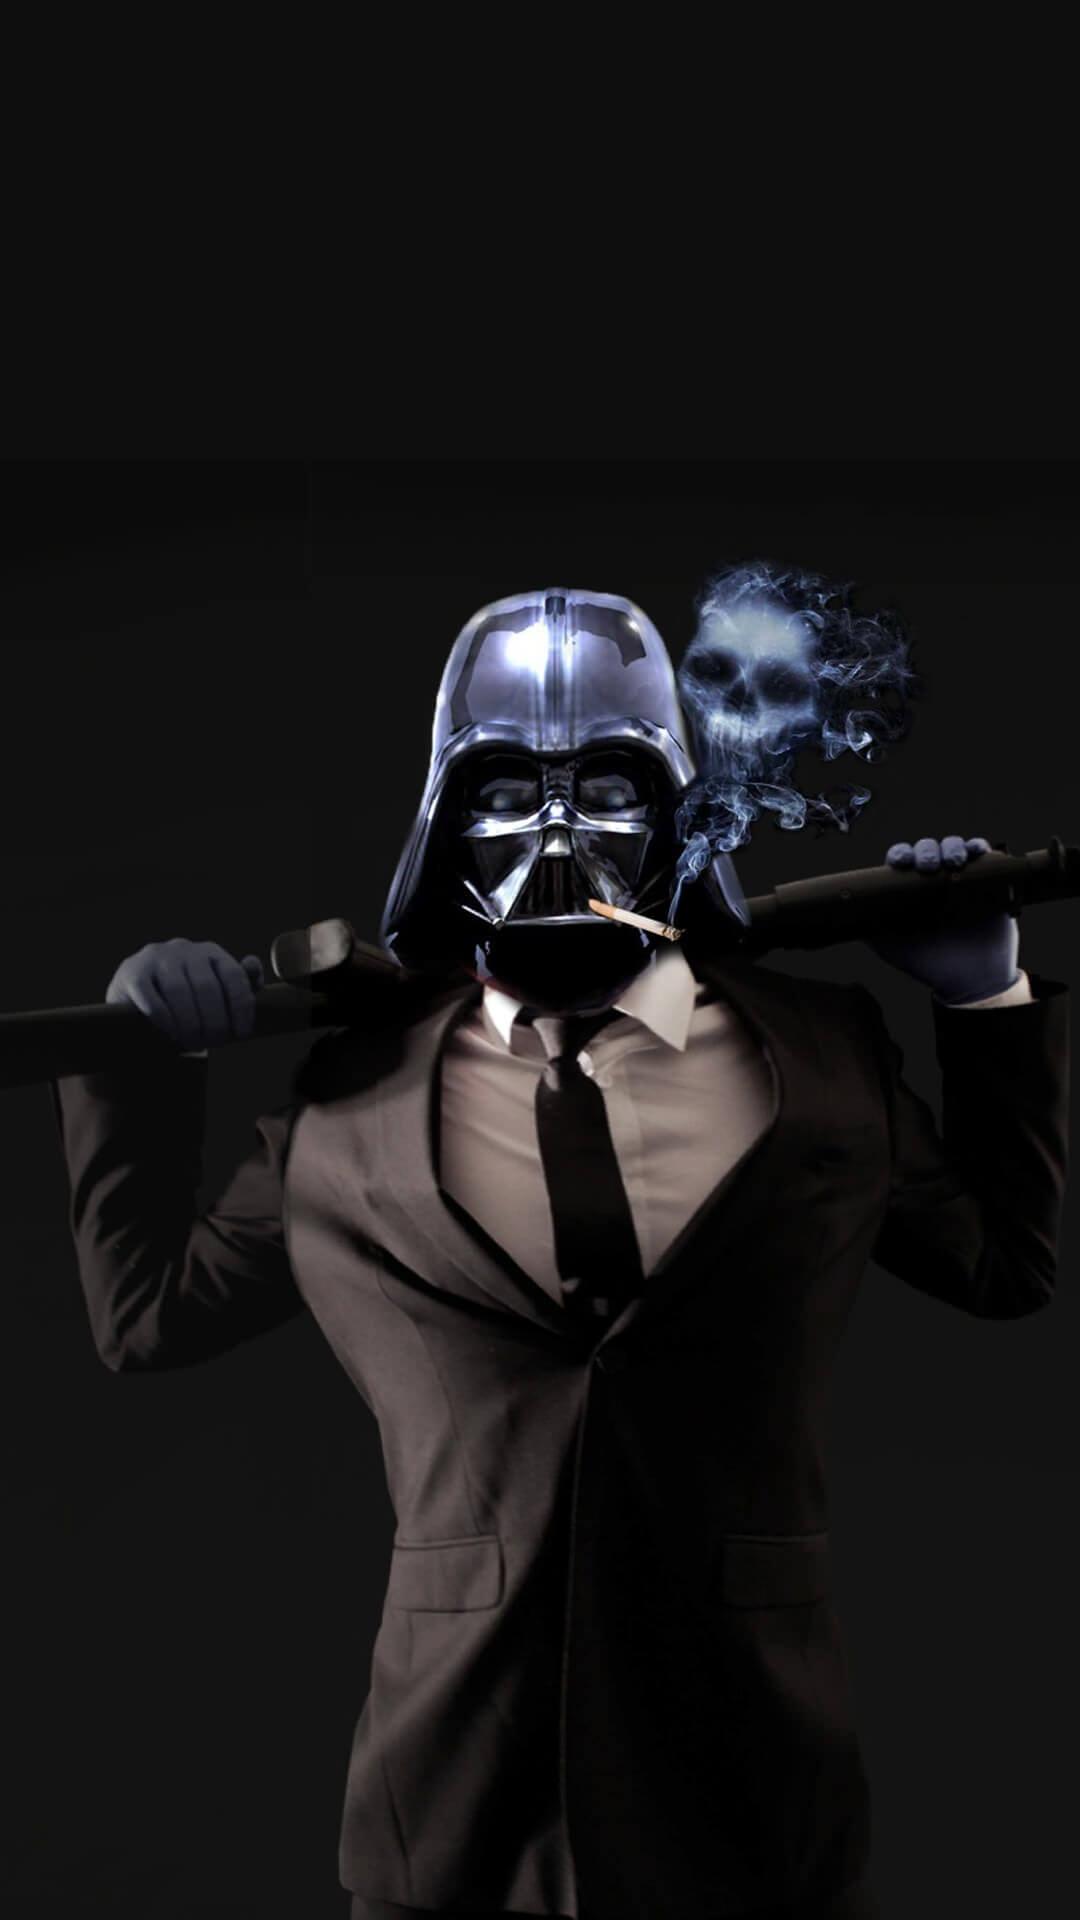 Dark Vader Wallpaper Iphone 2259659 Hd Wallpaper